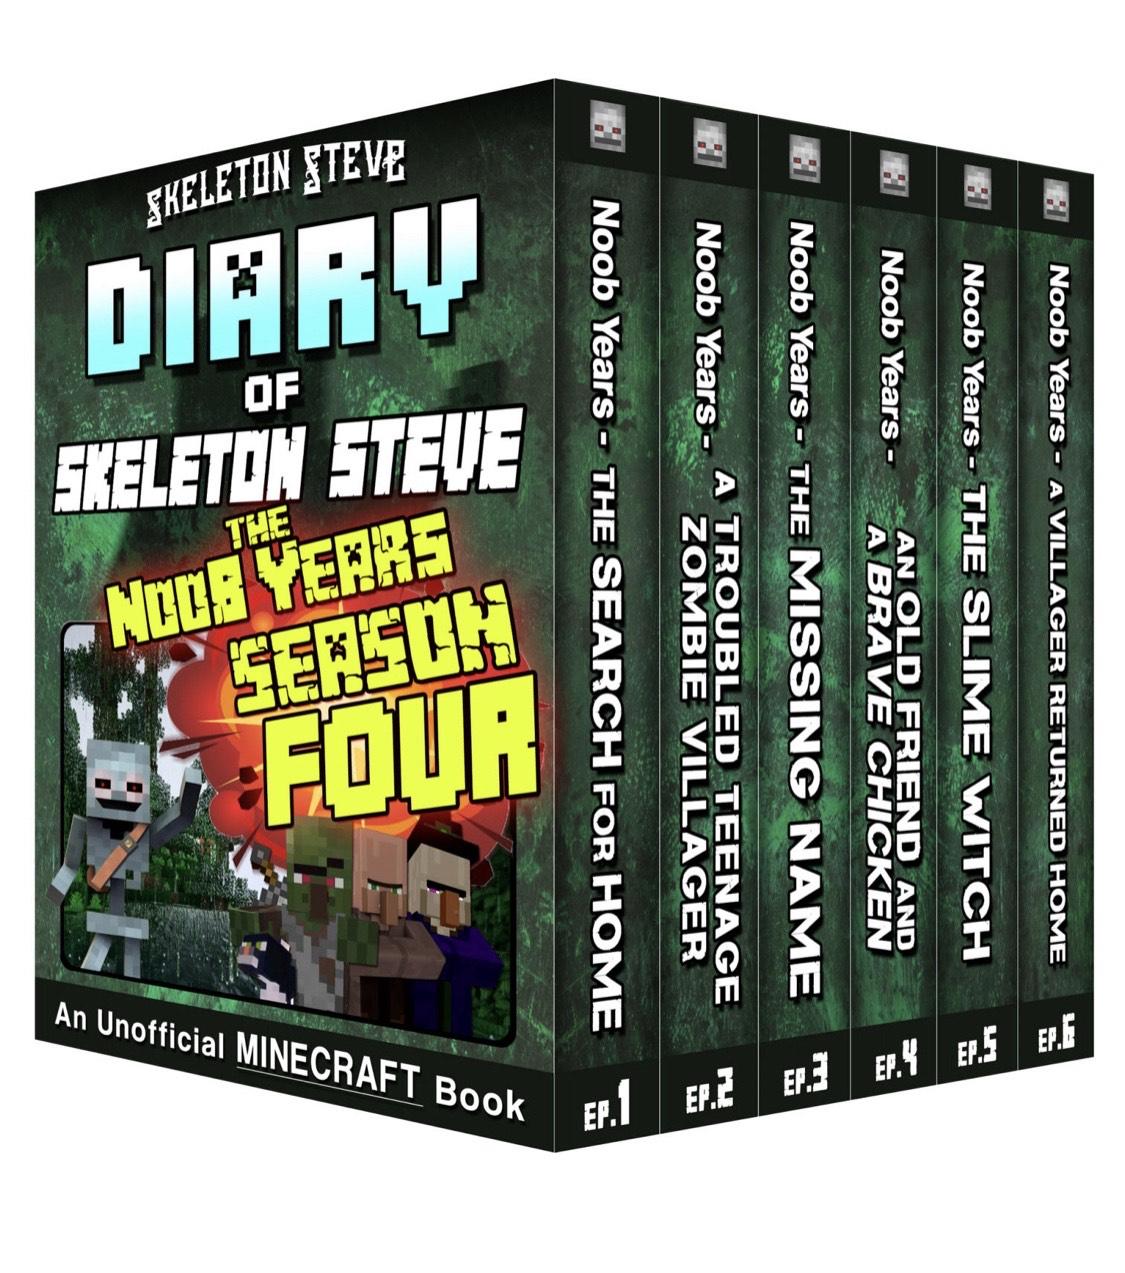 Free Kindle books - Minecraft Diary of Skeleton Steve the Noob Years - Full Season Four @ Amazon